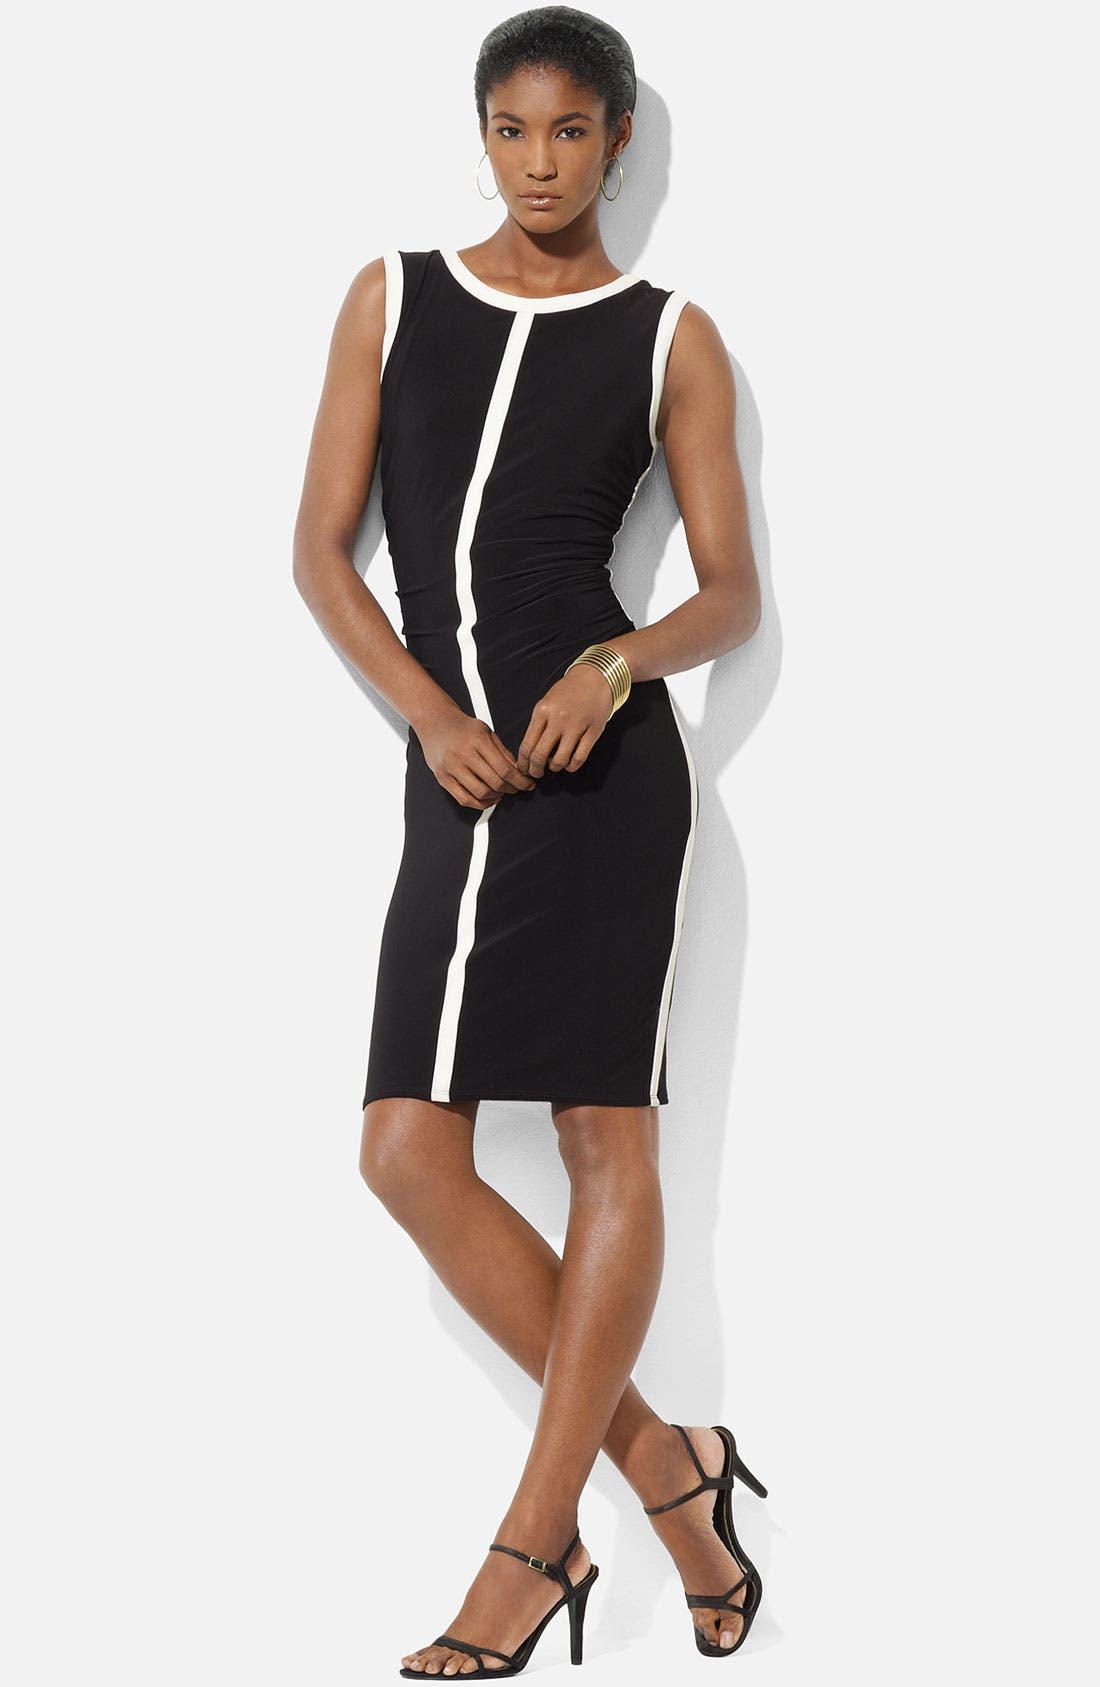 Alternate Image 1 Selected - Lauren Ralph Lauren 'Eras' Jersey Sheath Dress (Petite)